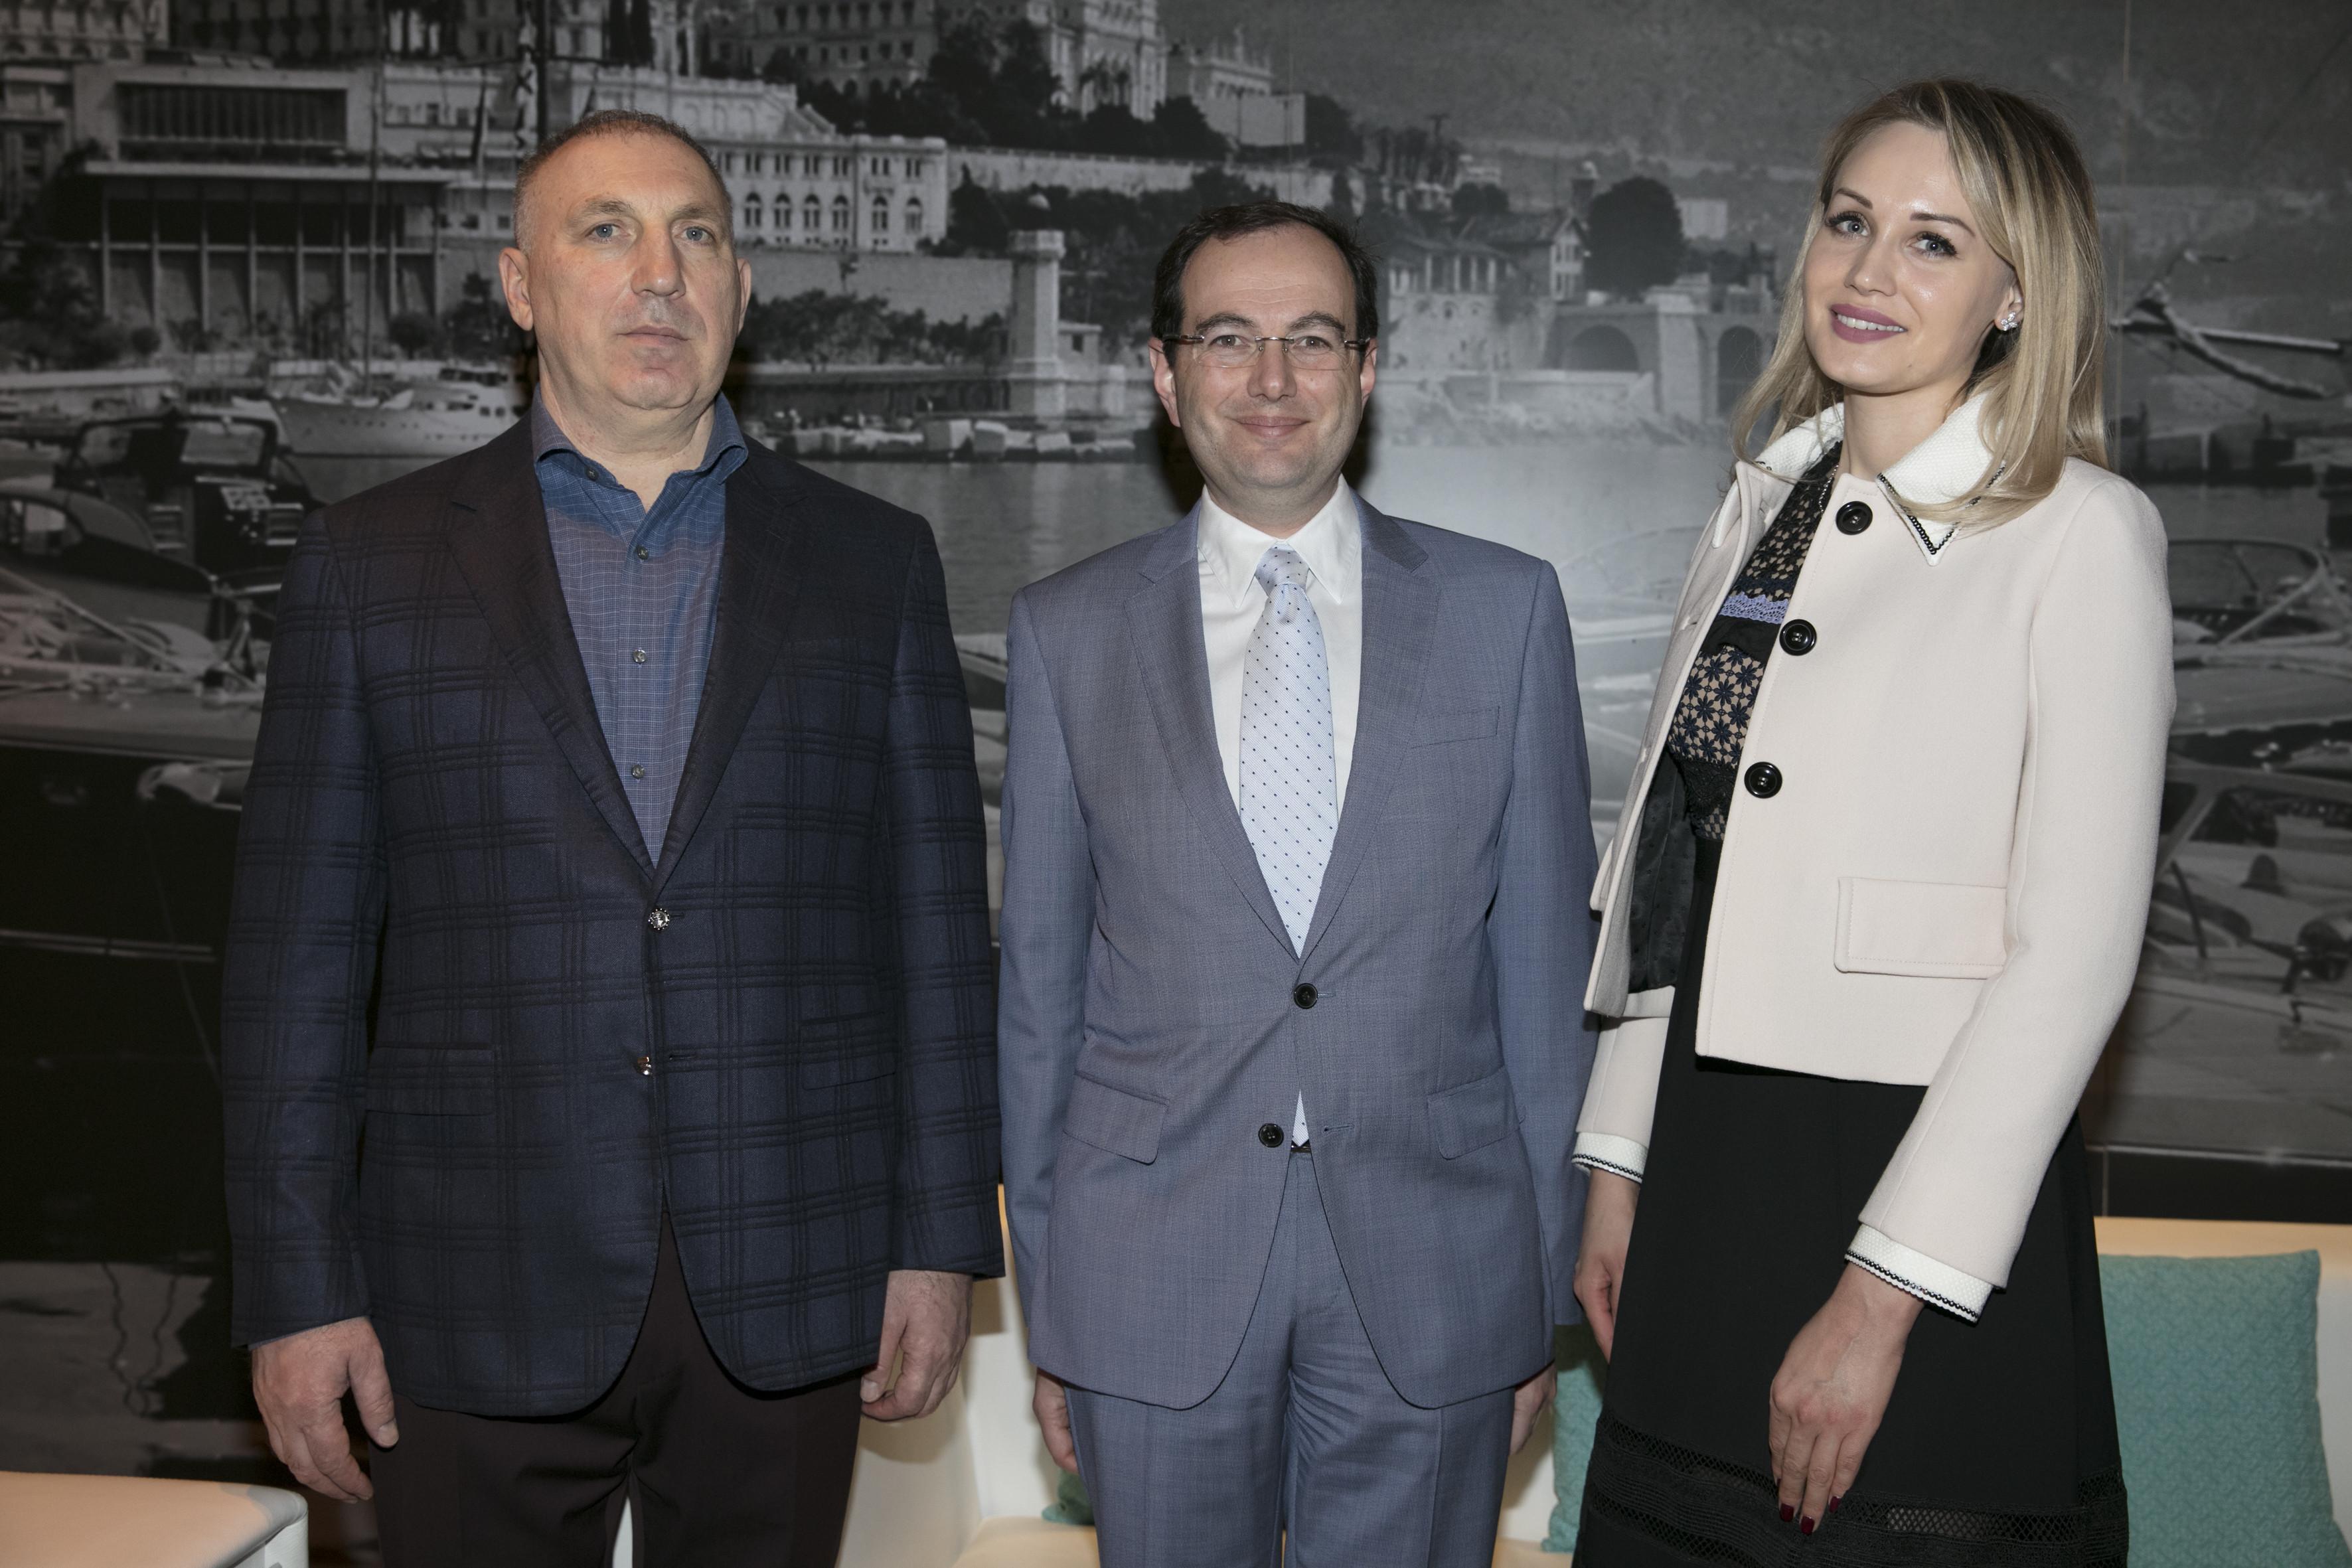 Alexey Antropov with Pascal Granero, Director of the Princess Charlene of Monaco Foundation, and Aya Glagoleva. Photo: International Philanthropy Summit Monaco.